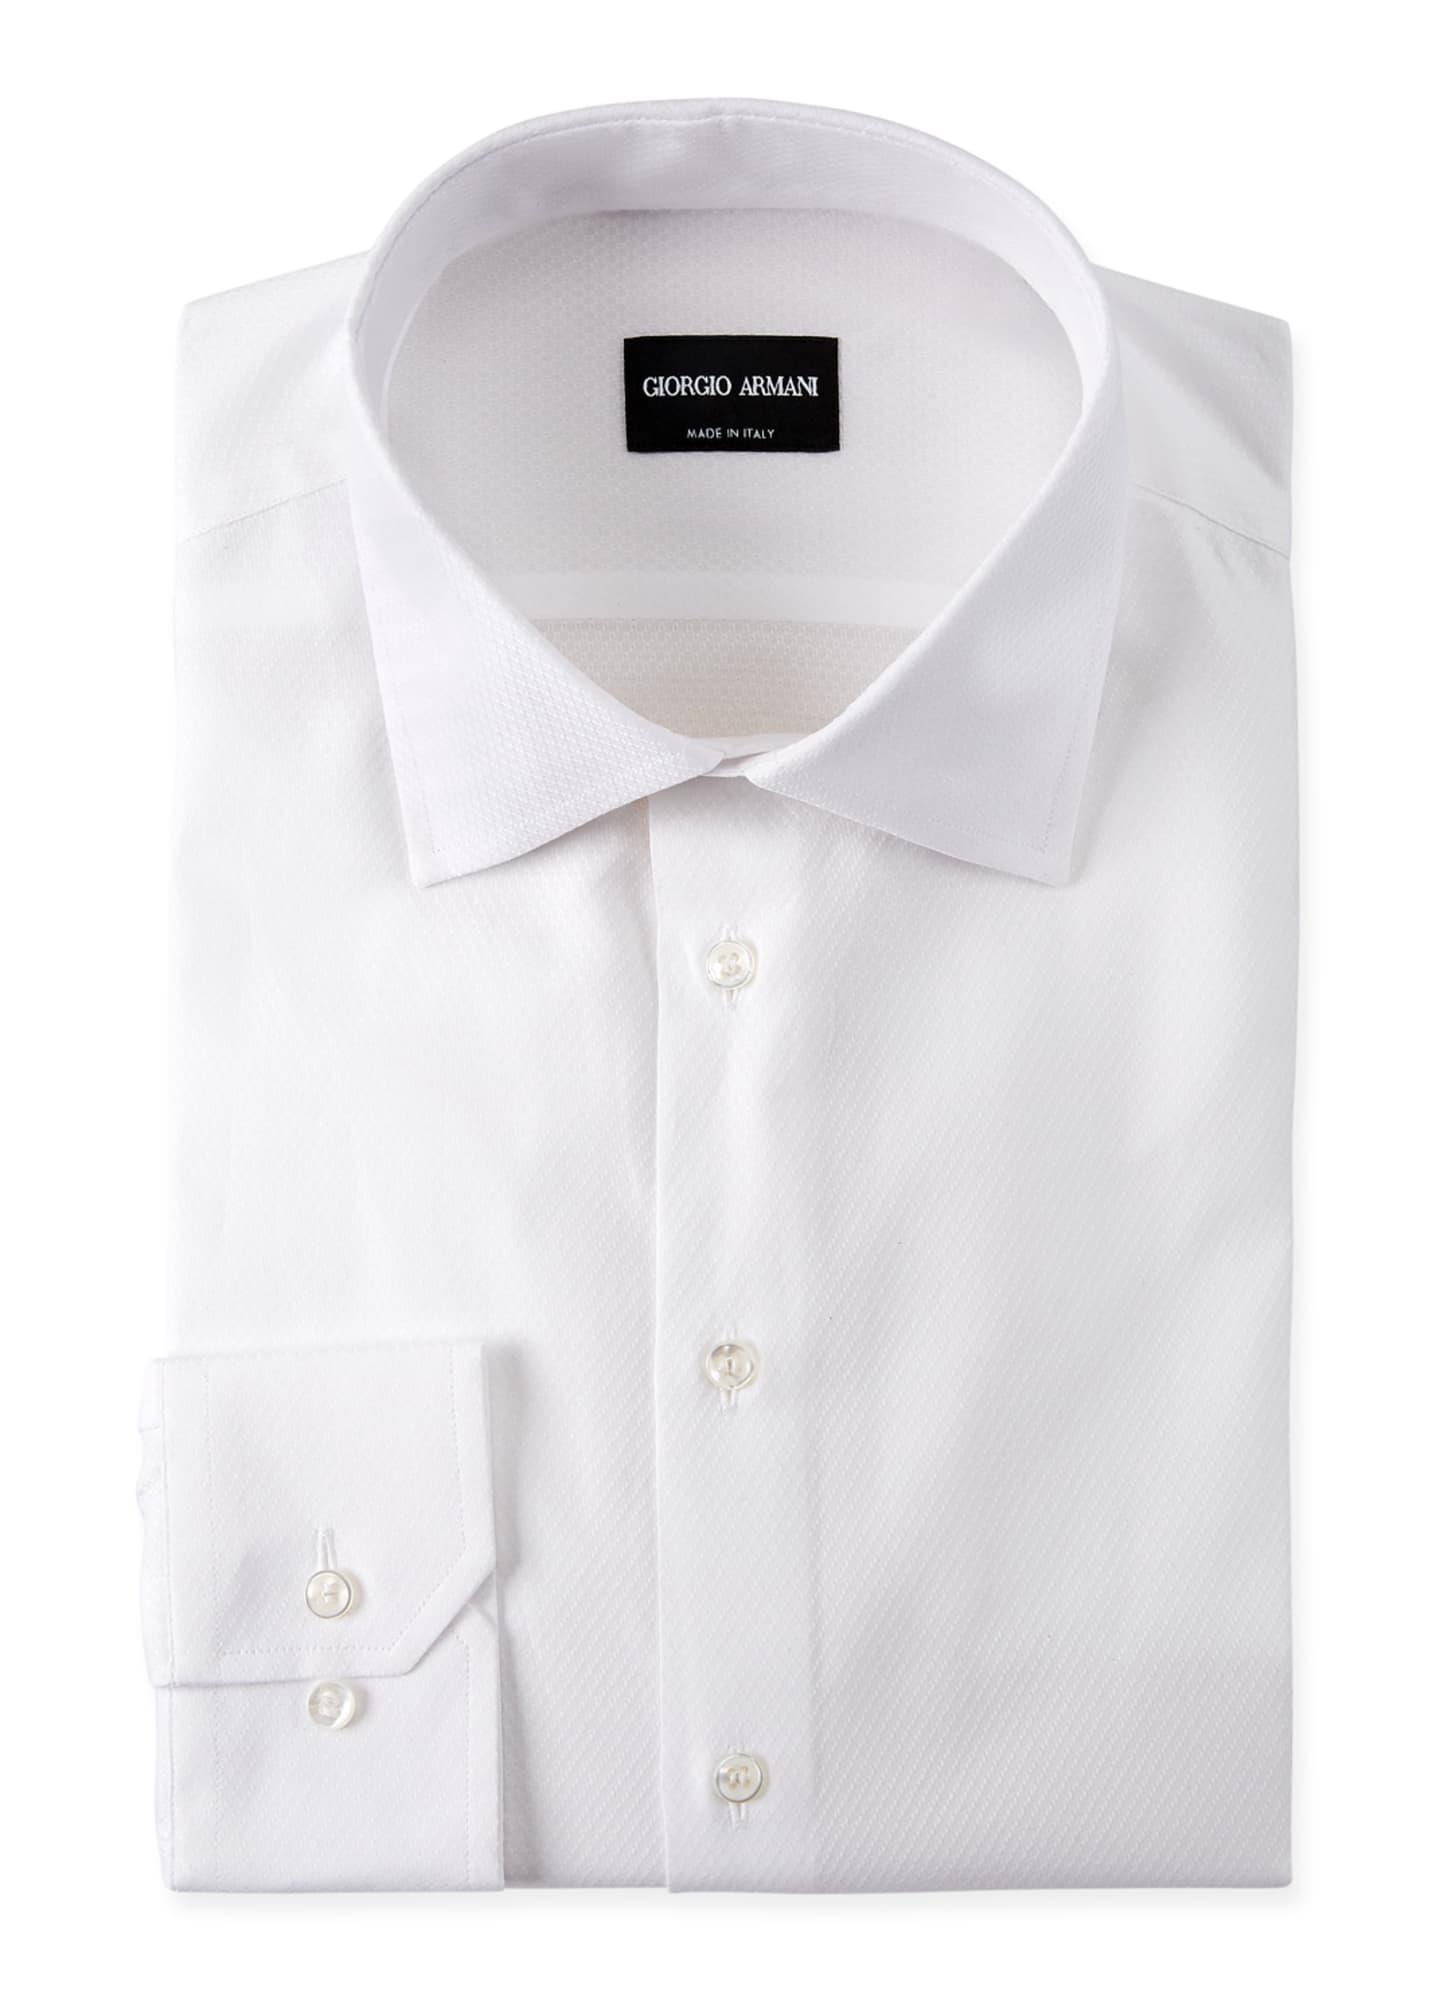 Giorgio Armani Men's Solid Textured Dress Shirt